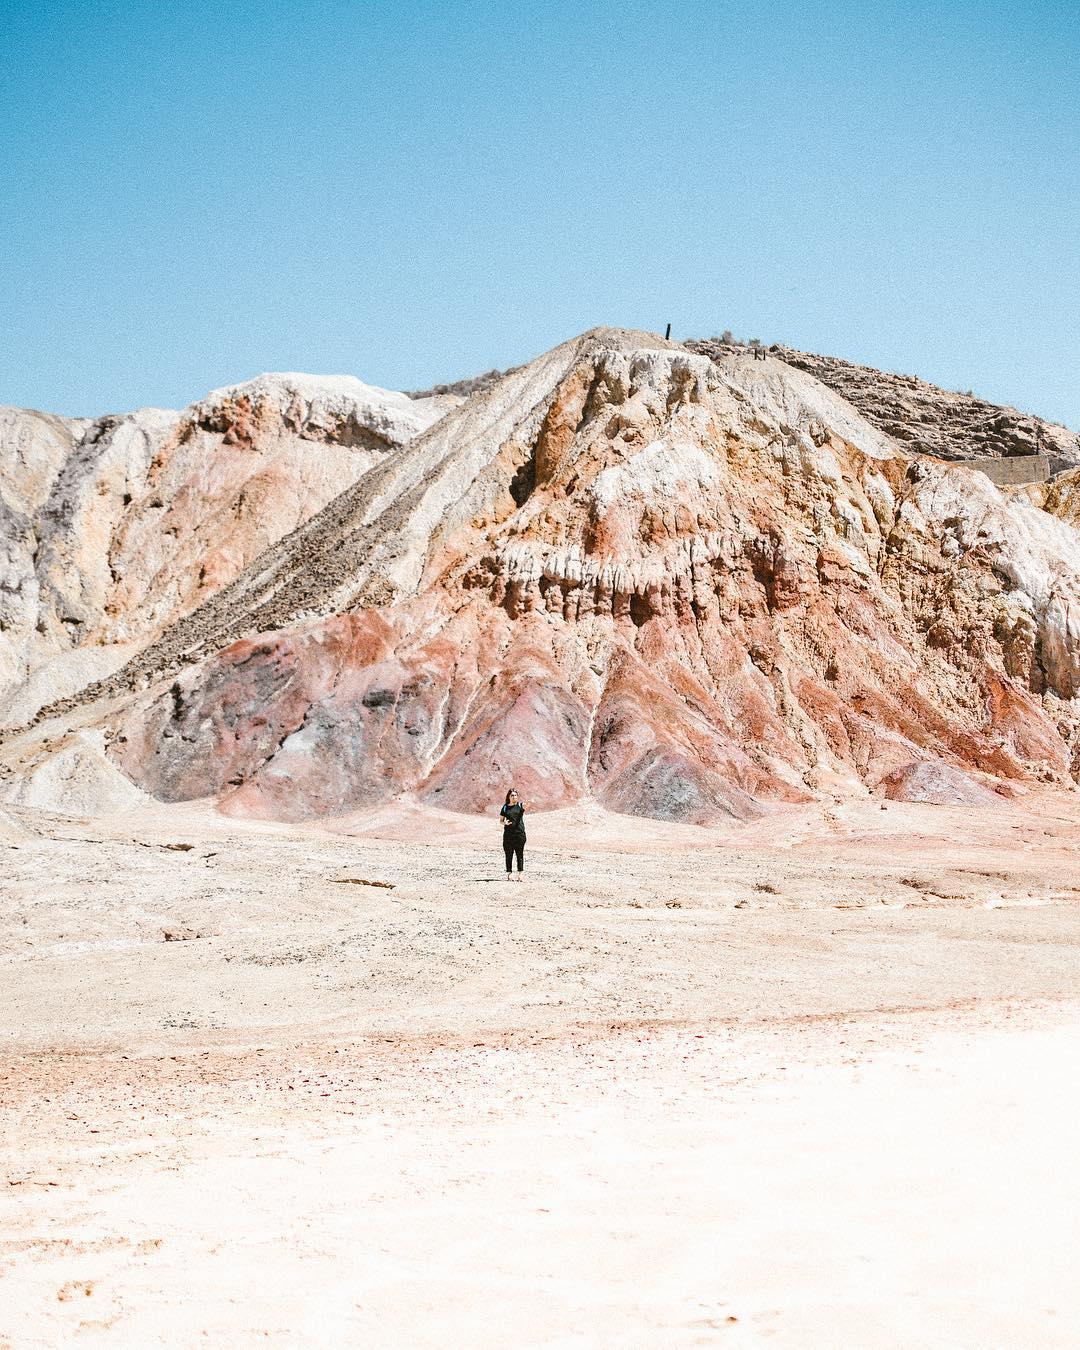 fotografo Joaquin Lucas paleta de colores de Wes Anderson  (45)